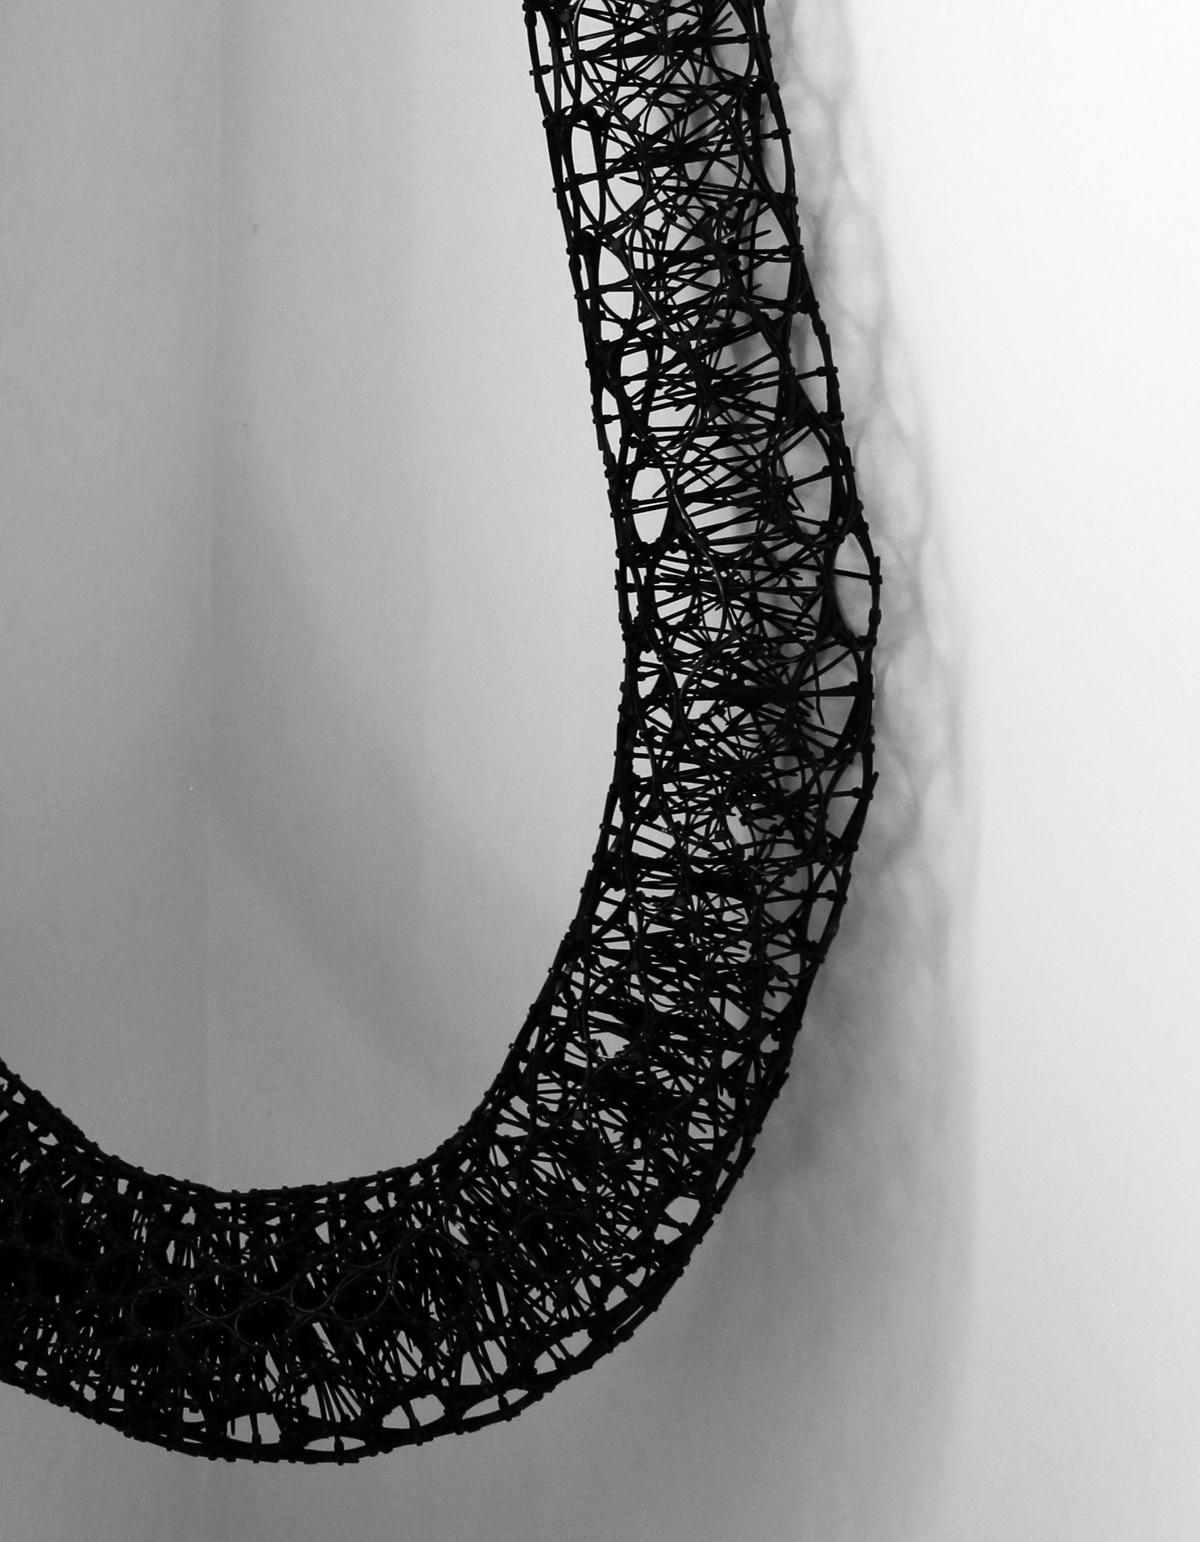 art art contemporary art black and white cable ties fiber art key hole sculpture textile art visual art zip ties